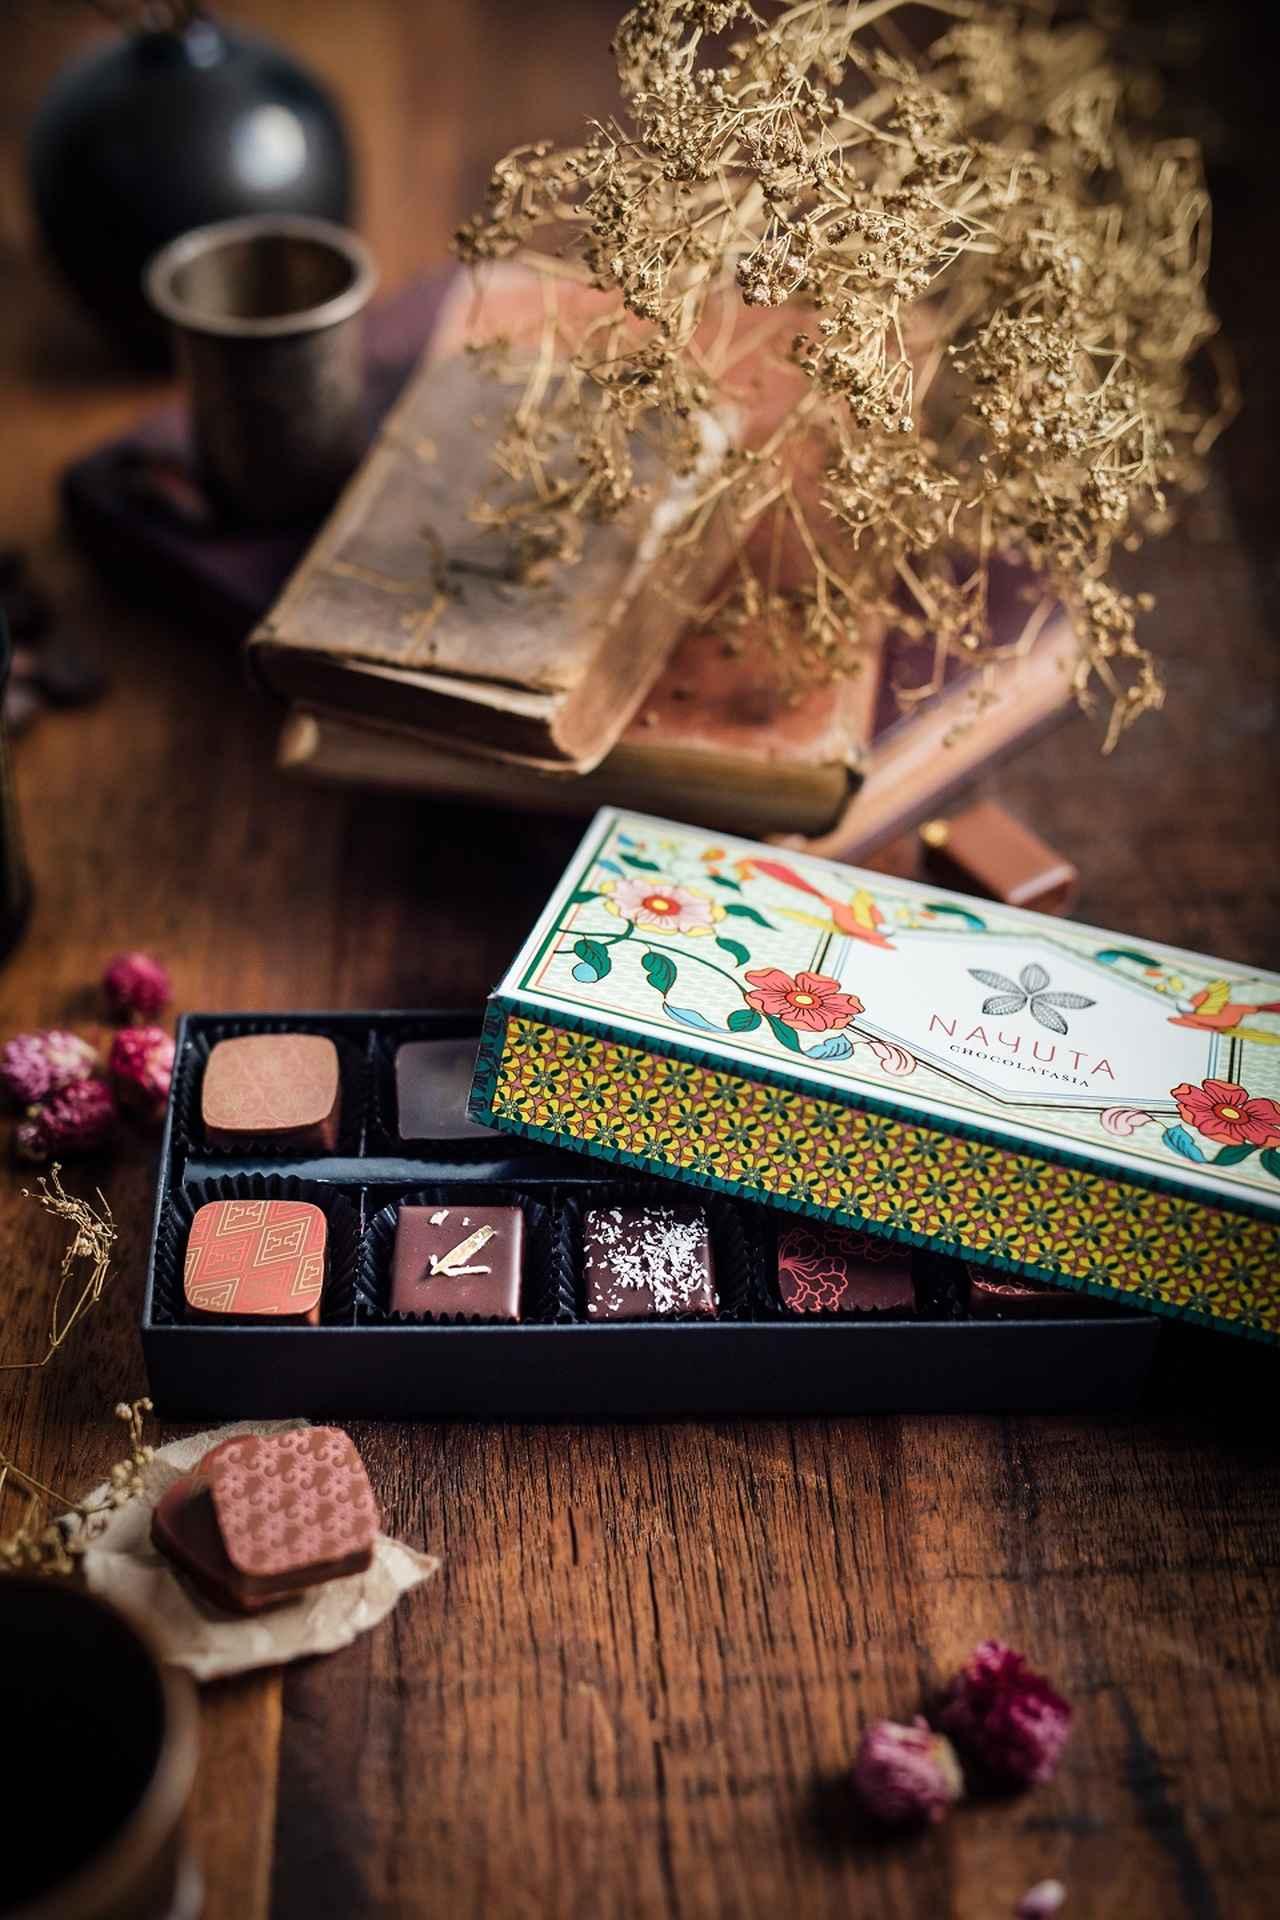 "Images : 4番目の画像 - 「アジア発、""日本人好み""の チョコレート「NAYUTA  CHOCOLATASIA」」のアルバム - T JAPAN:The New York Times Style Magazine 公式サイト"